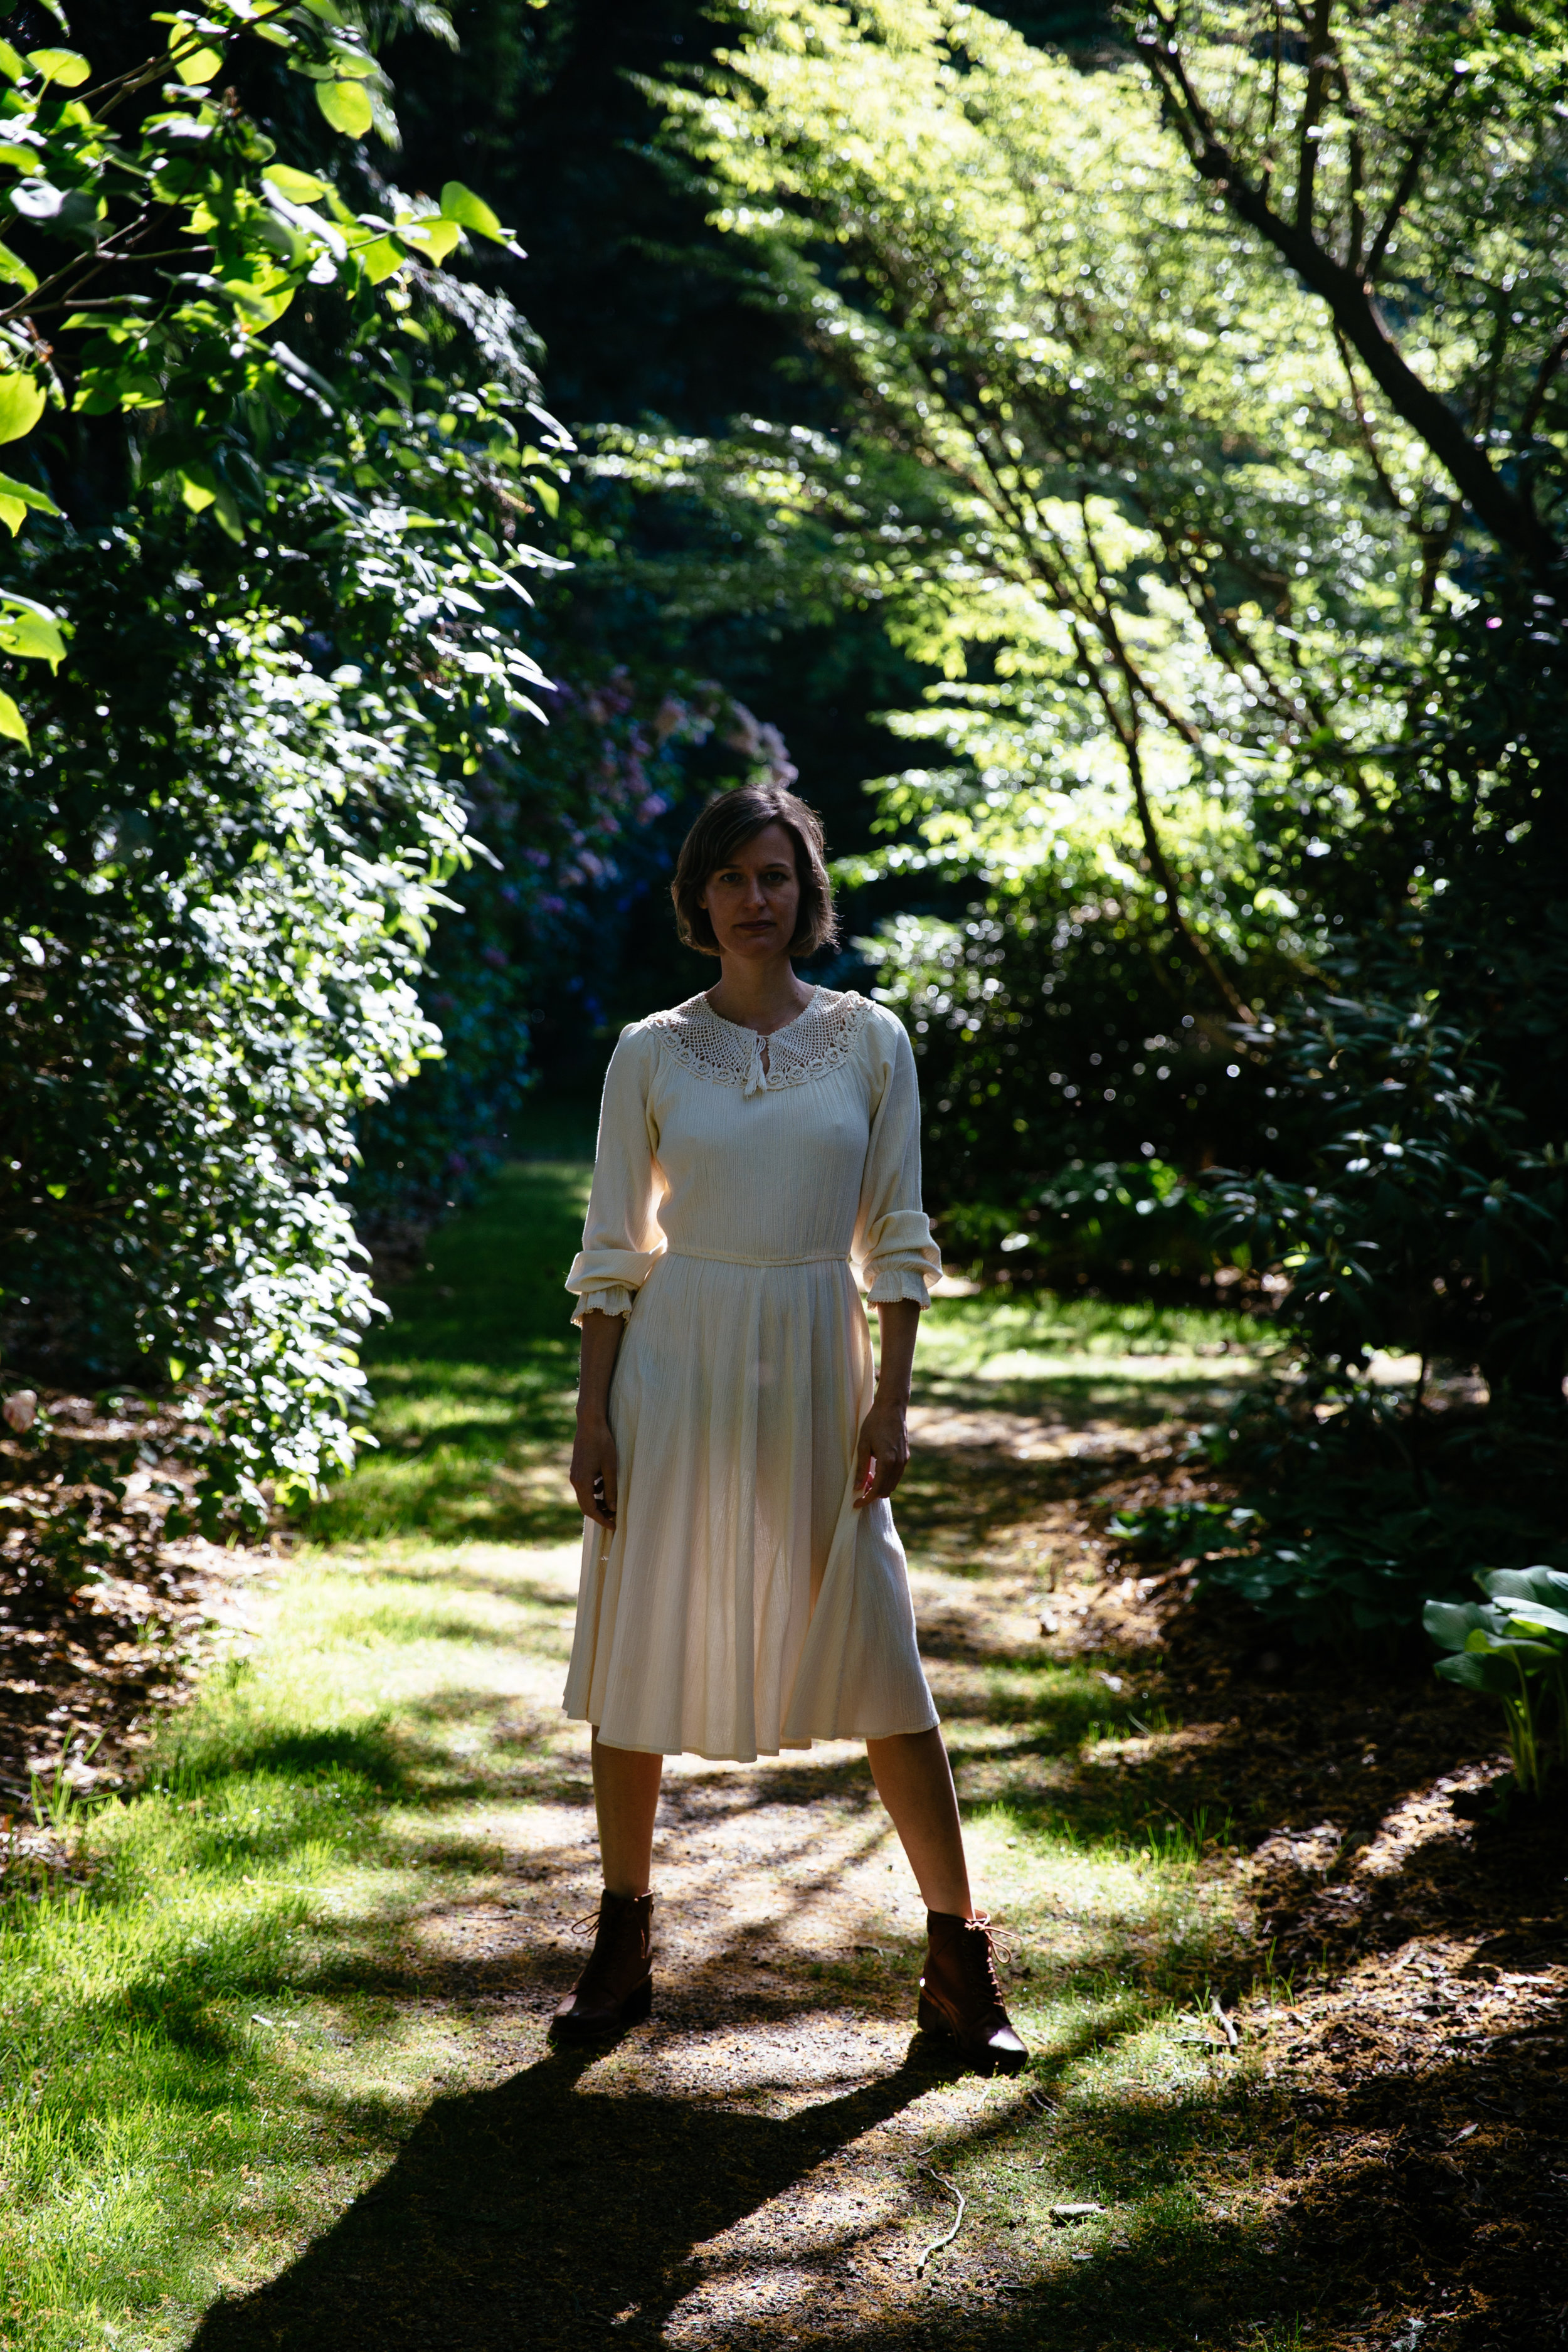 Elaine Schimek among lilacs and hostas